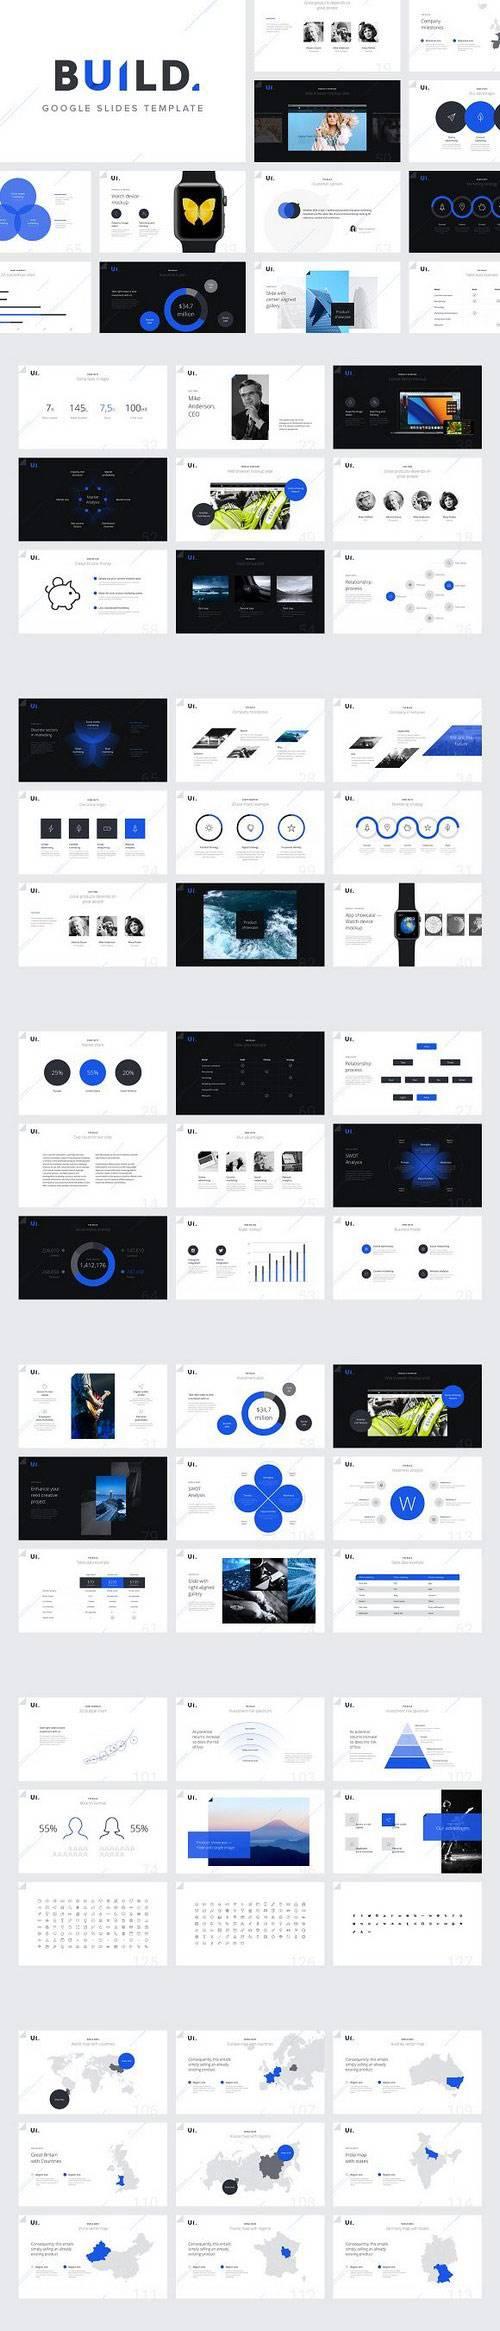 CM - BUILD Google Slides Template 1133851